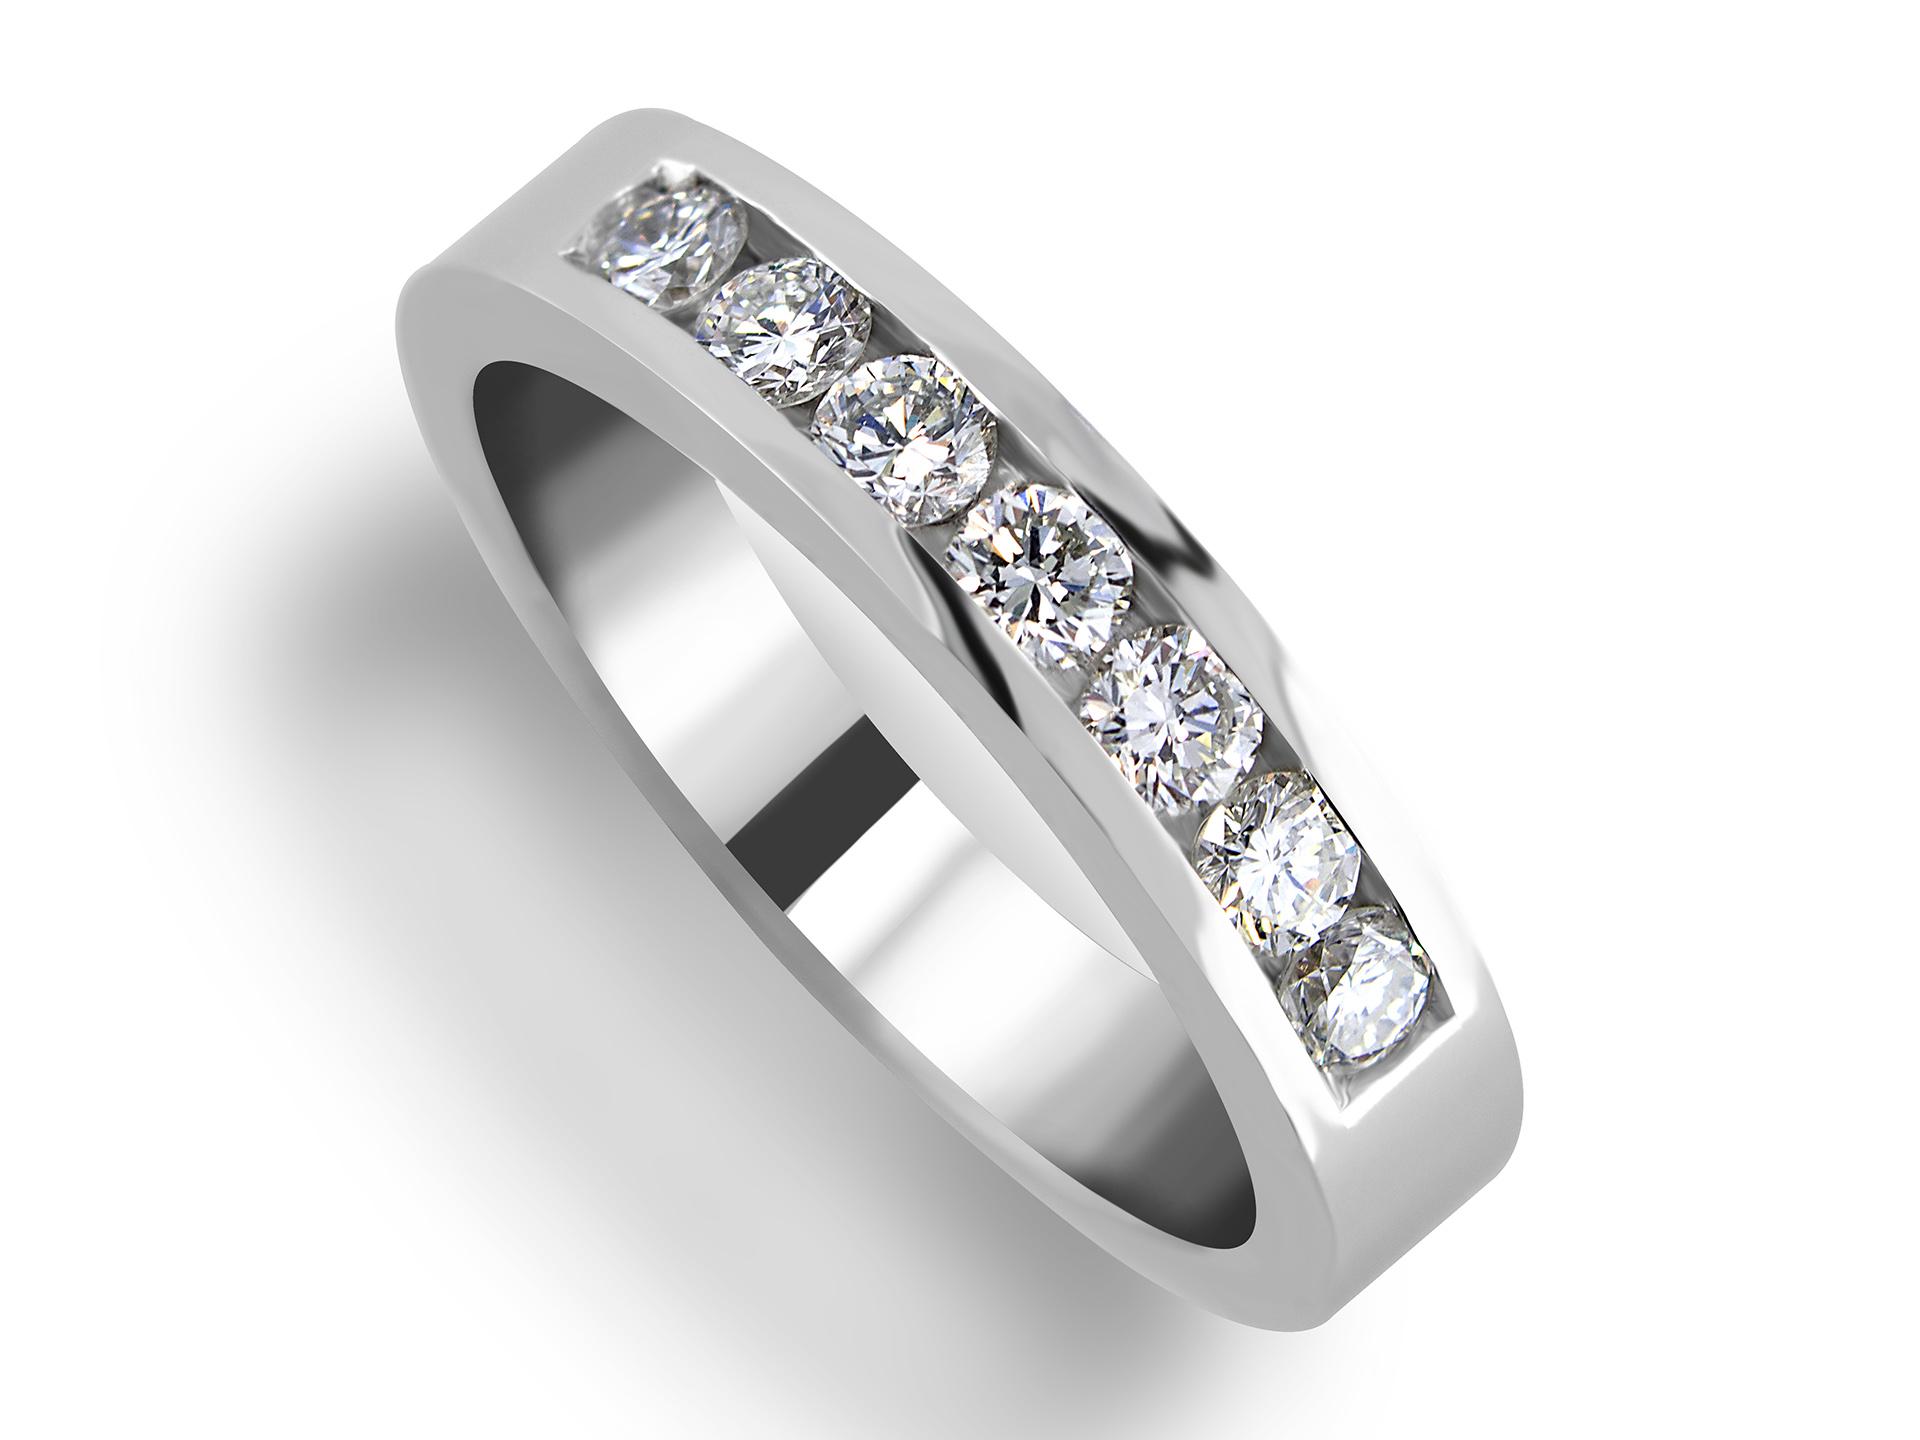 Diamonds channel set ladies wedding anniversary ring